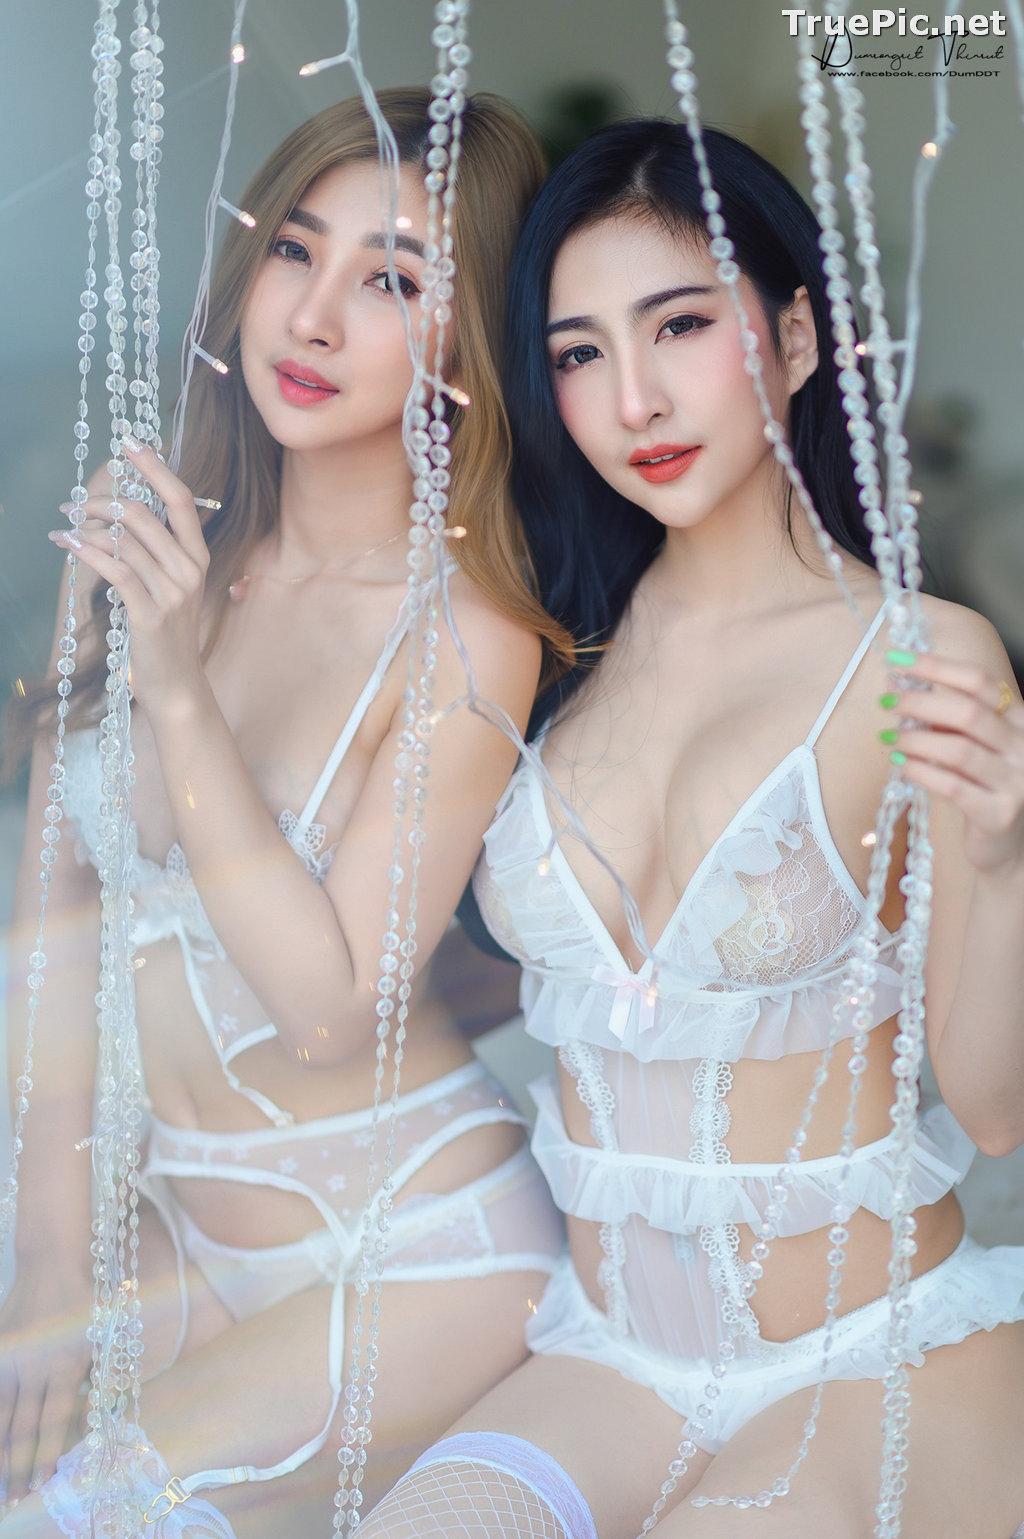 Image Thailand Model - Pattamaporn Keawkum & Anita Bunpan - Girls & Light - TruePic.net - Picture-1